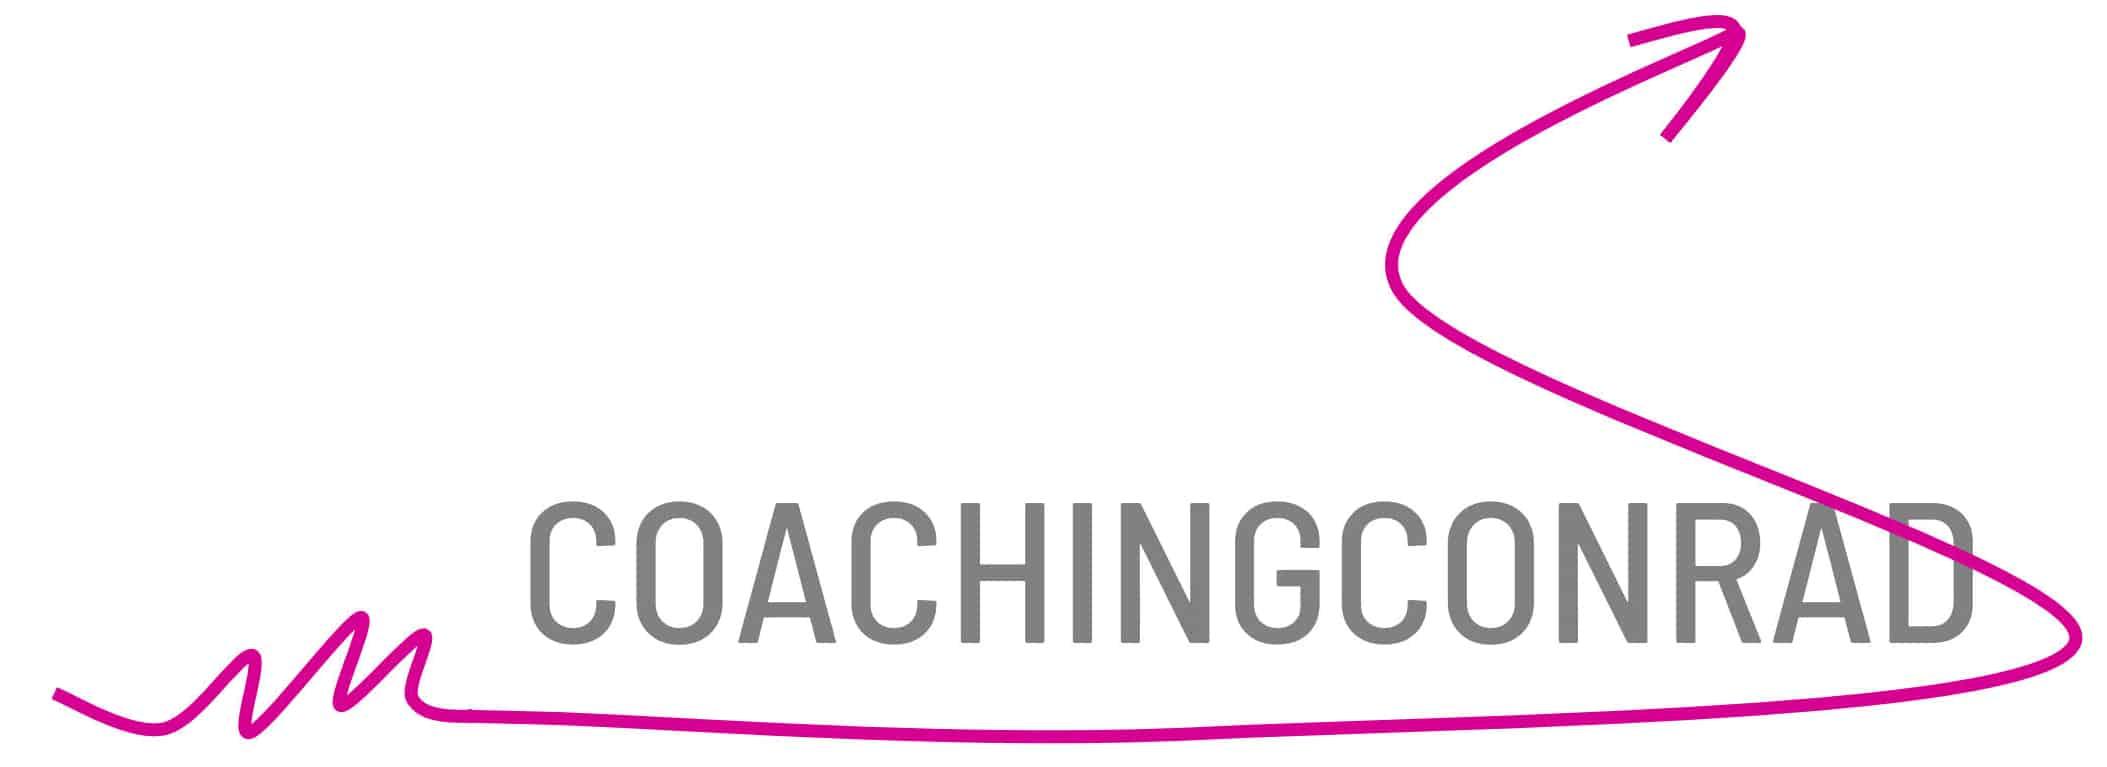 CoachingConrad Logo